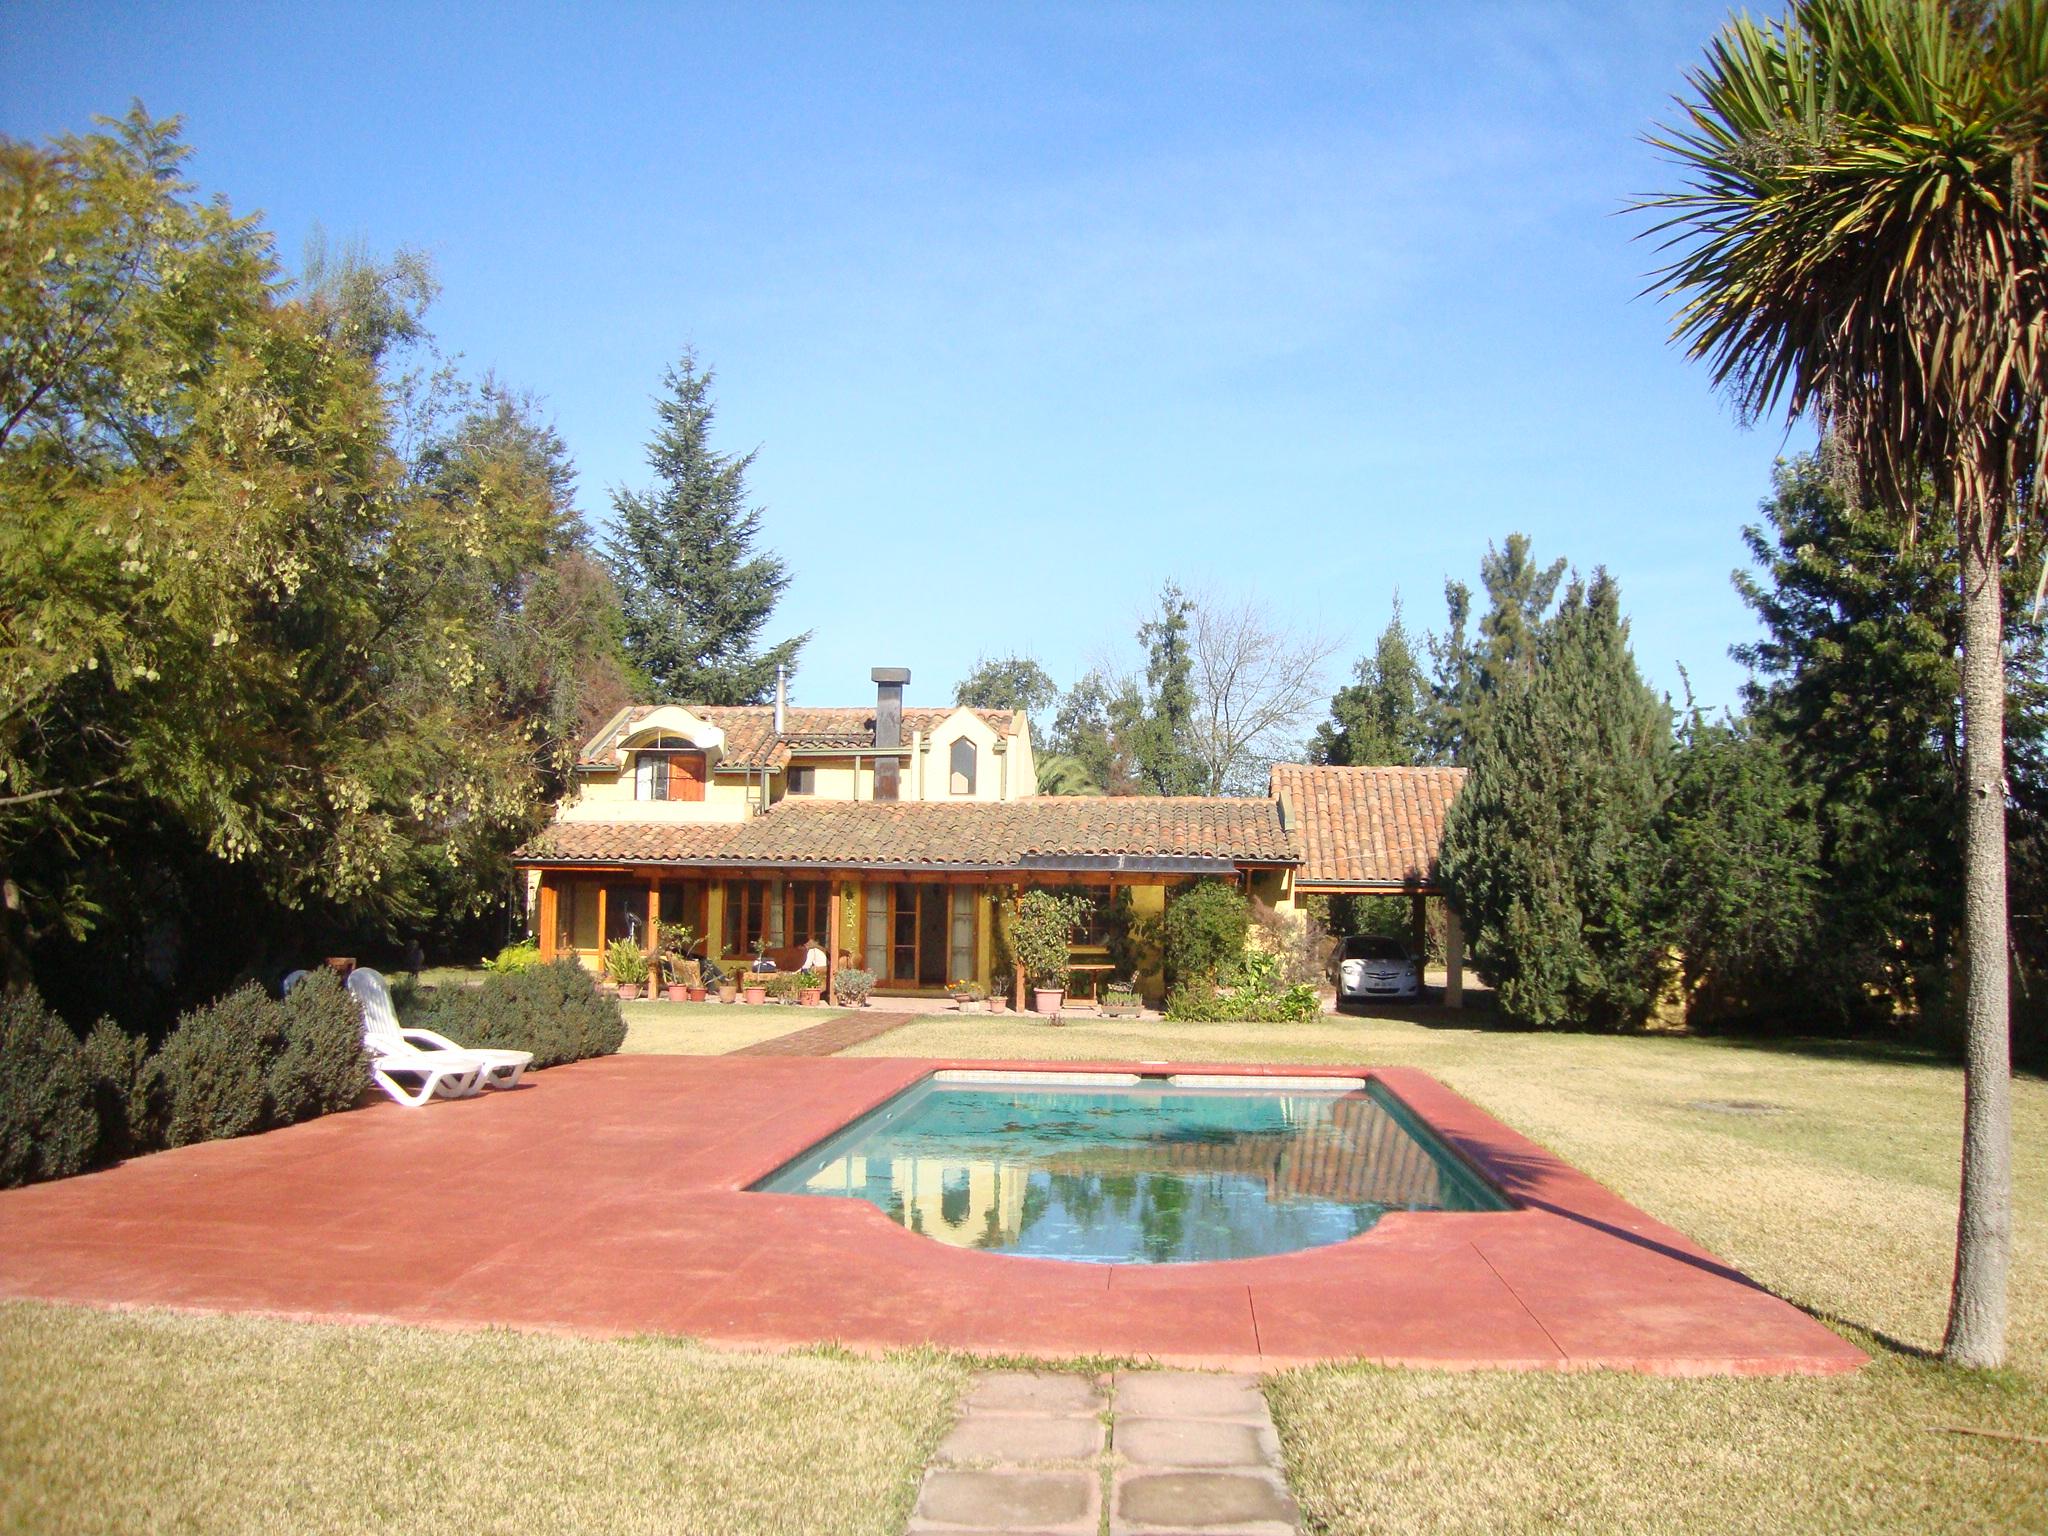 Gran casa cerca de San Fernando en parcela de 5290 m2